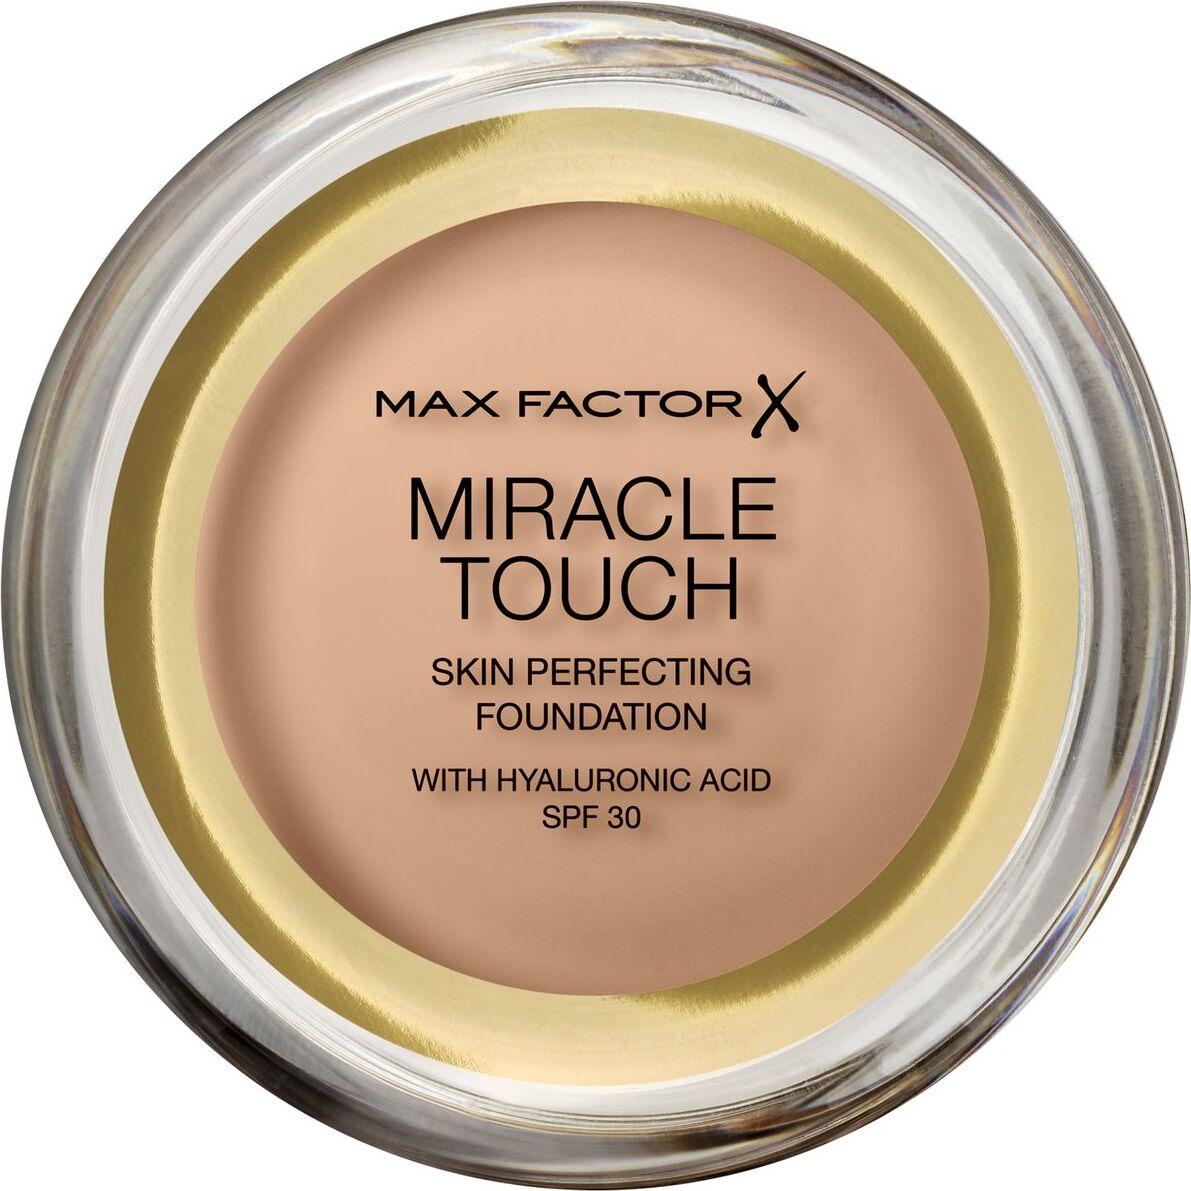 Тональная основа Max Factor Miracle Touch, SPF 30, тон 75 Golden, 11 мл основа под макияж max factor miracle prep colour correcting cooling тон green 30 мл